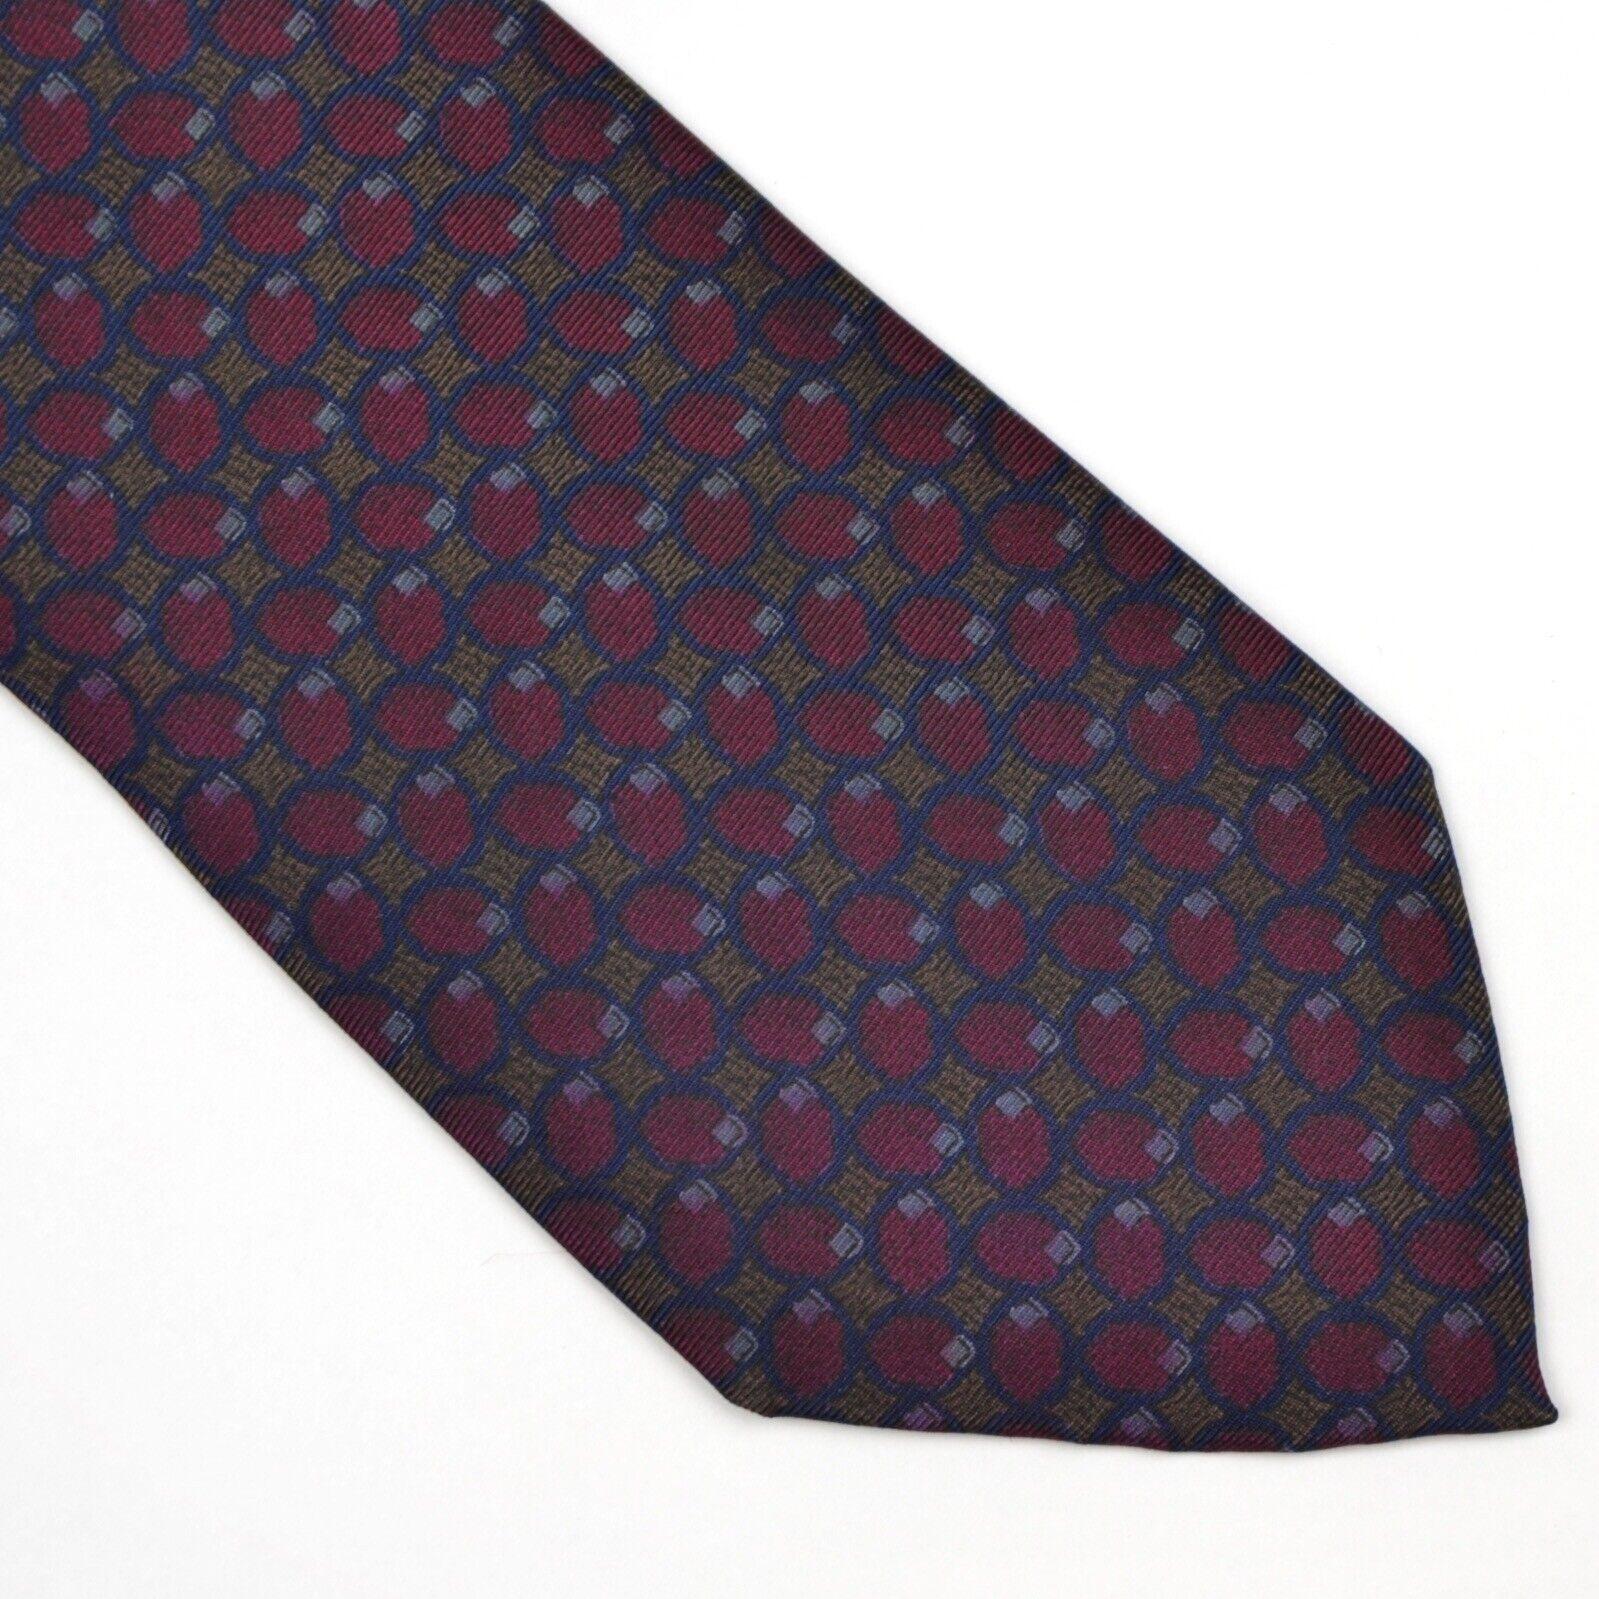 Lanvin Paris 100% Seide Silk Krawatte Tie Made in Italy HERBST Burgunderrot Blau